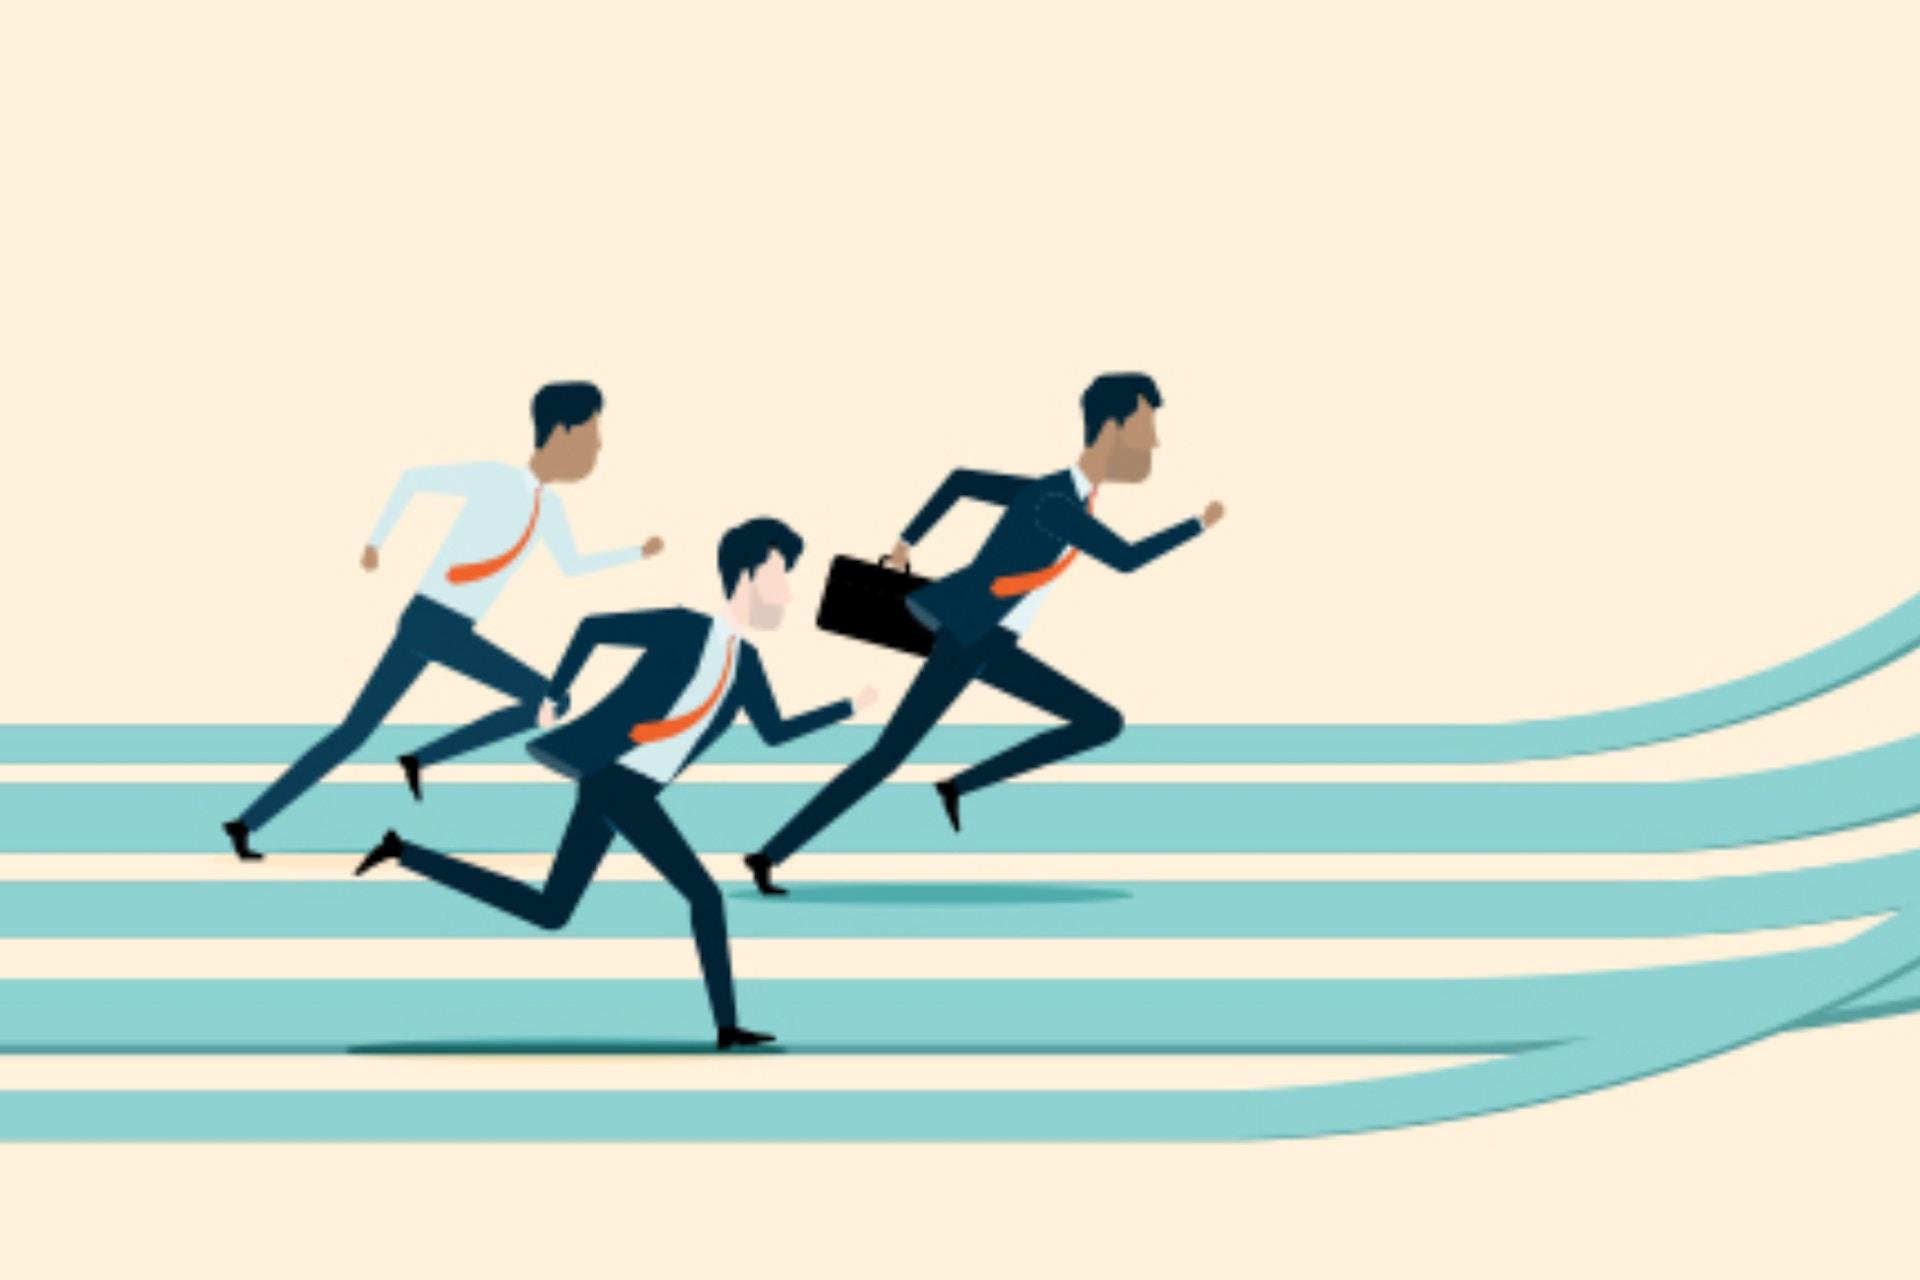 Illustration of three men running on an inclined teal running track